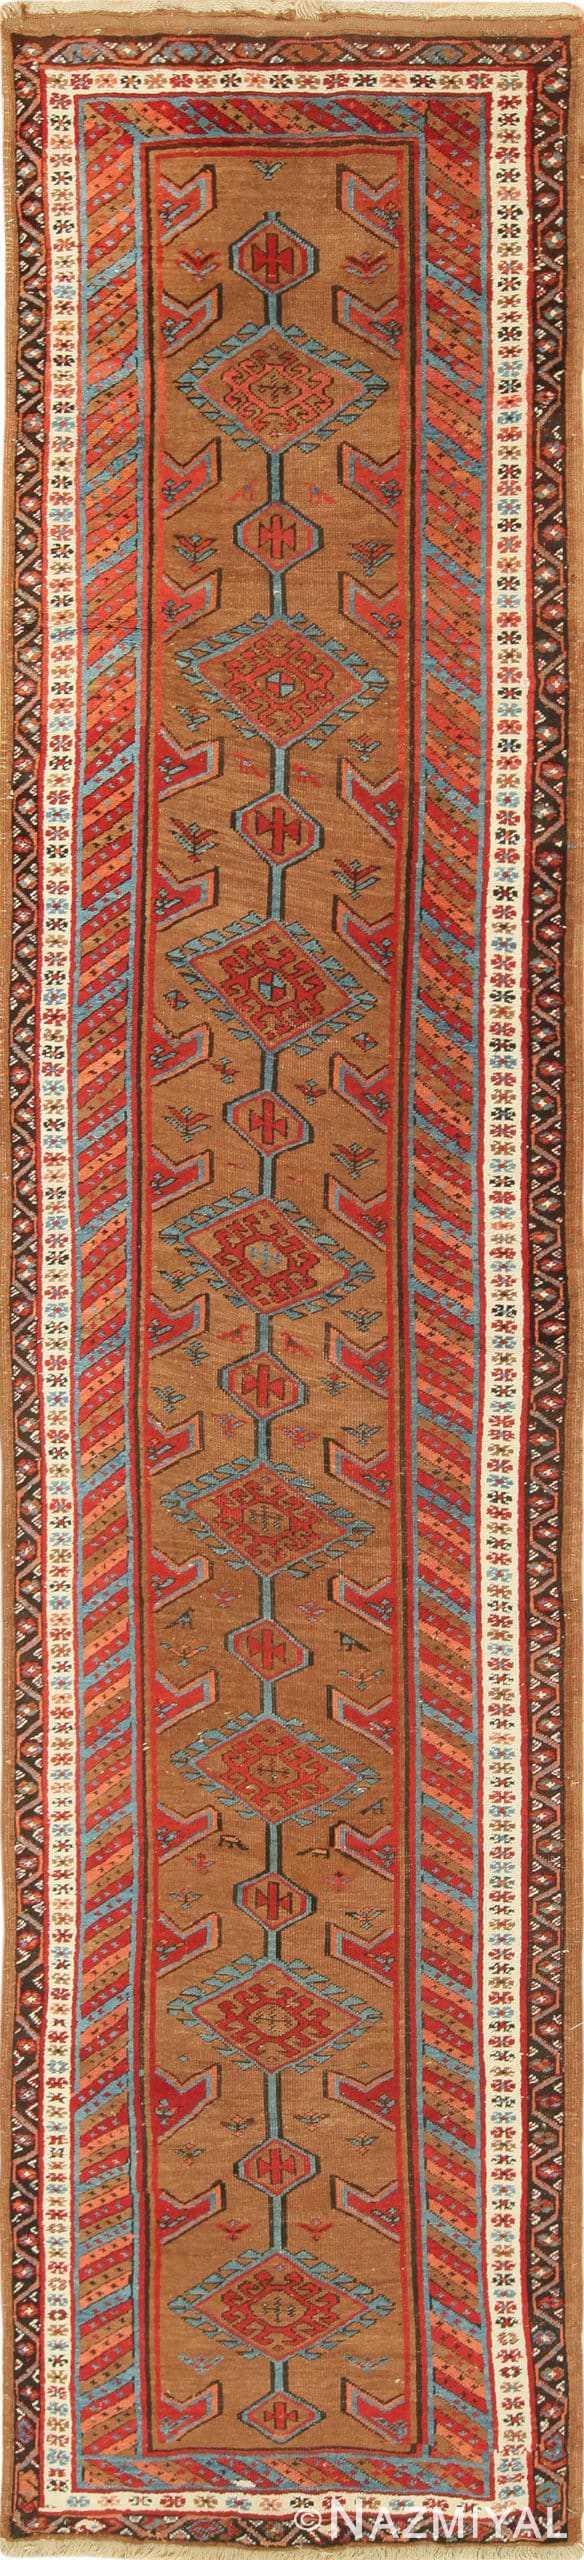 Antique Tribal Persian Bakshaish Runner Rug 49709 by Nazmiyal